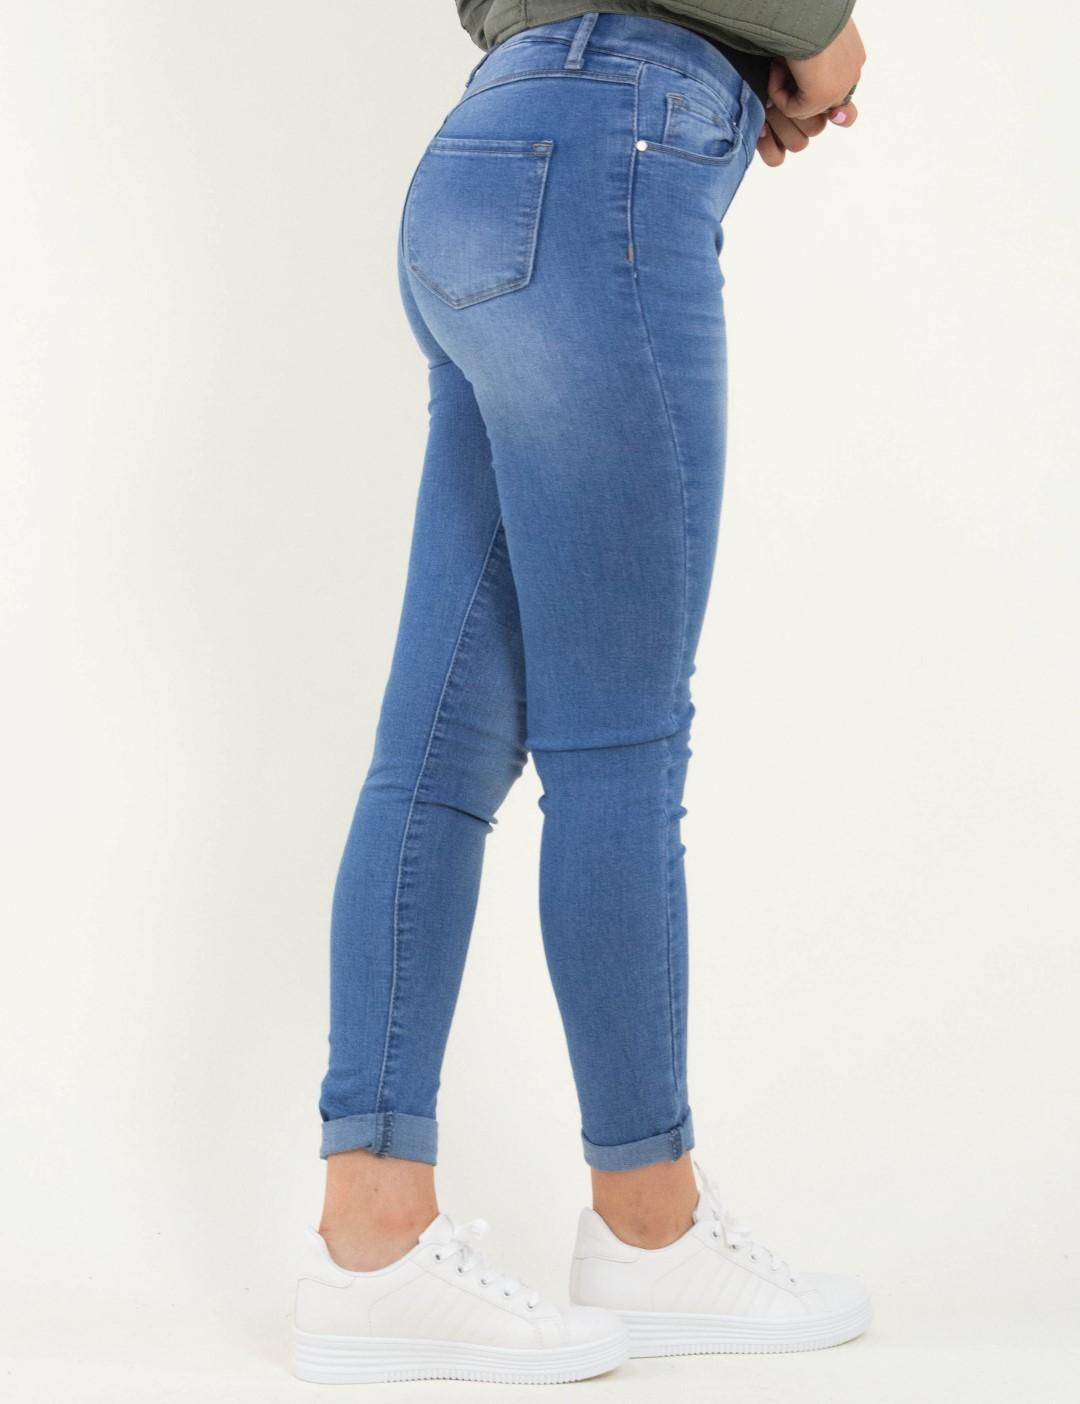 6a1507fac1 Γυναικείο μπλε ελαστικό τζιν παντελόνι με λάστιχο CY1115